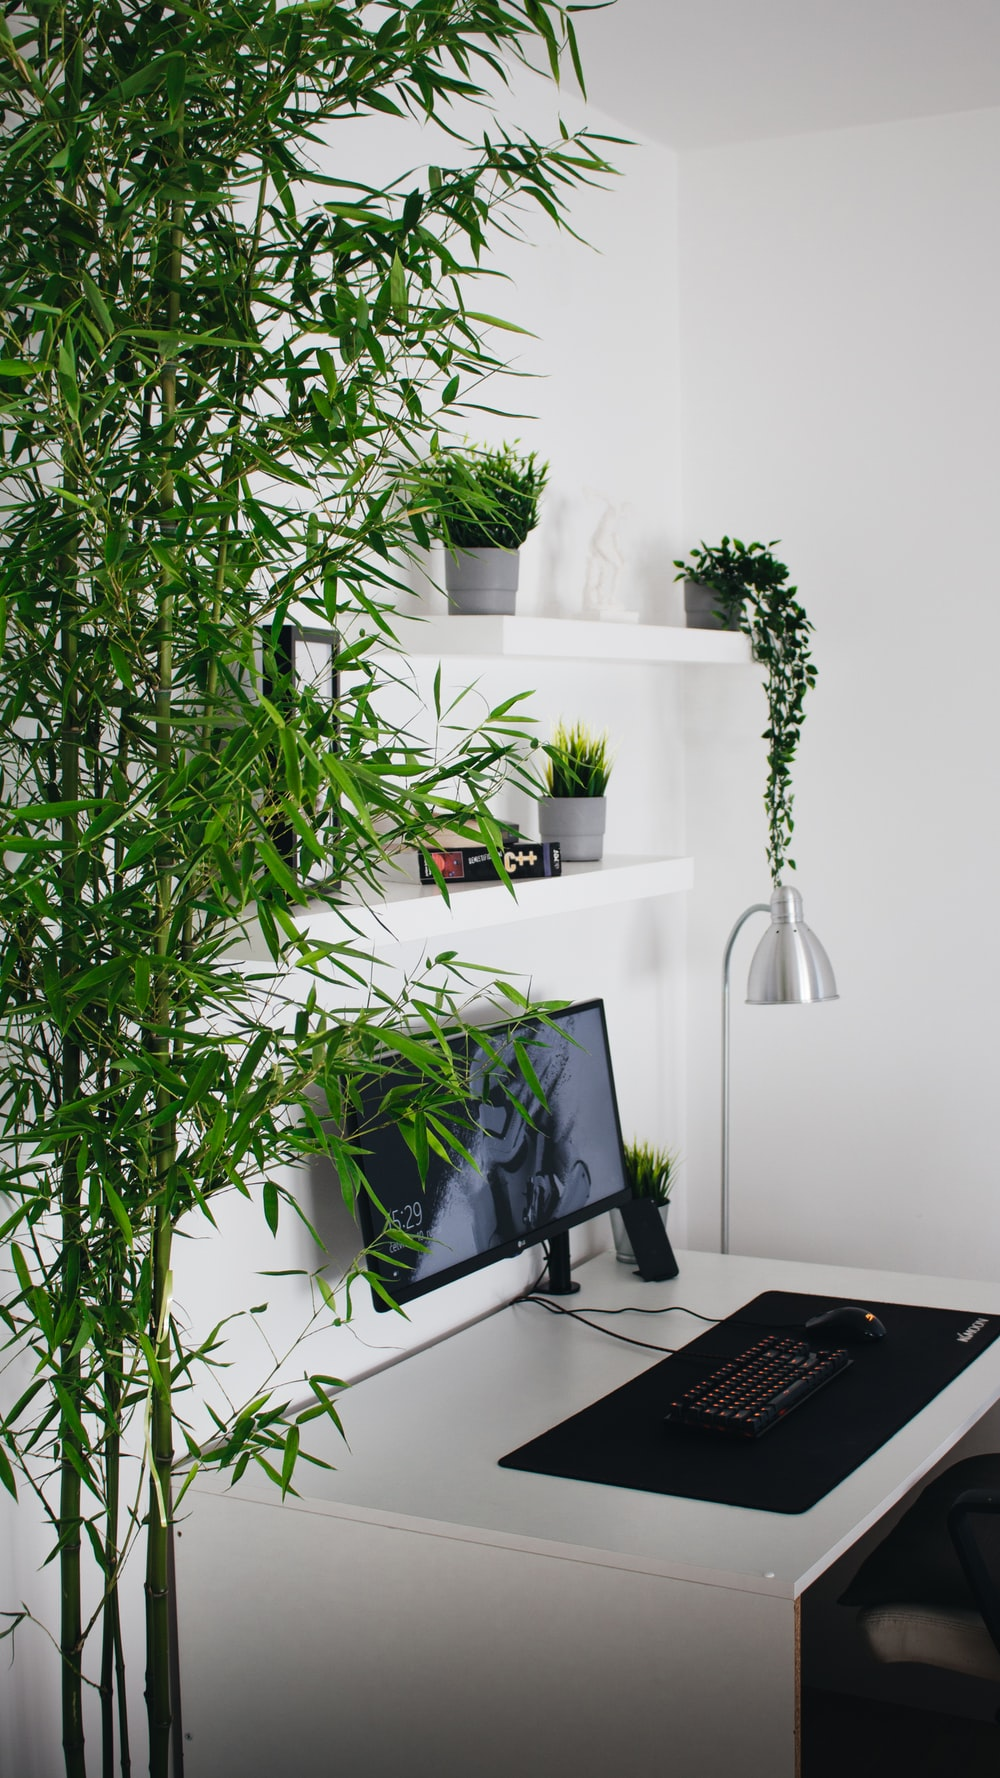 green plant near black laptop computer